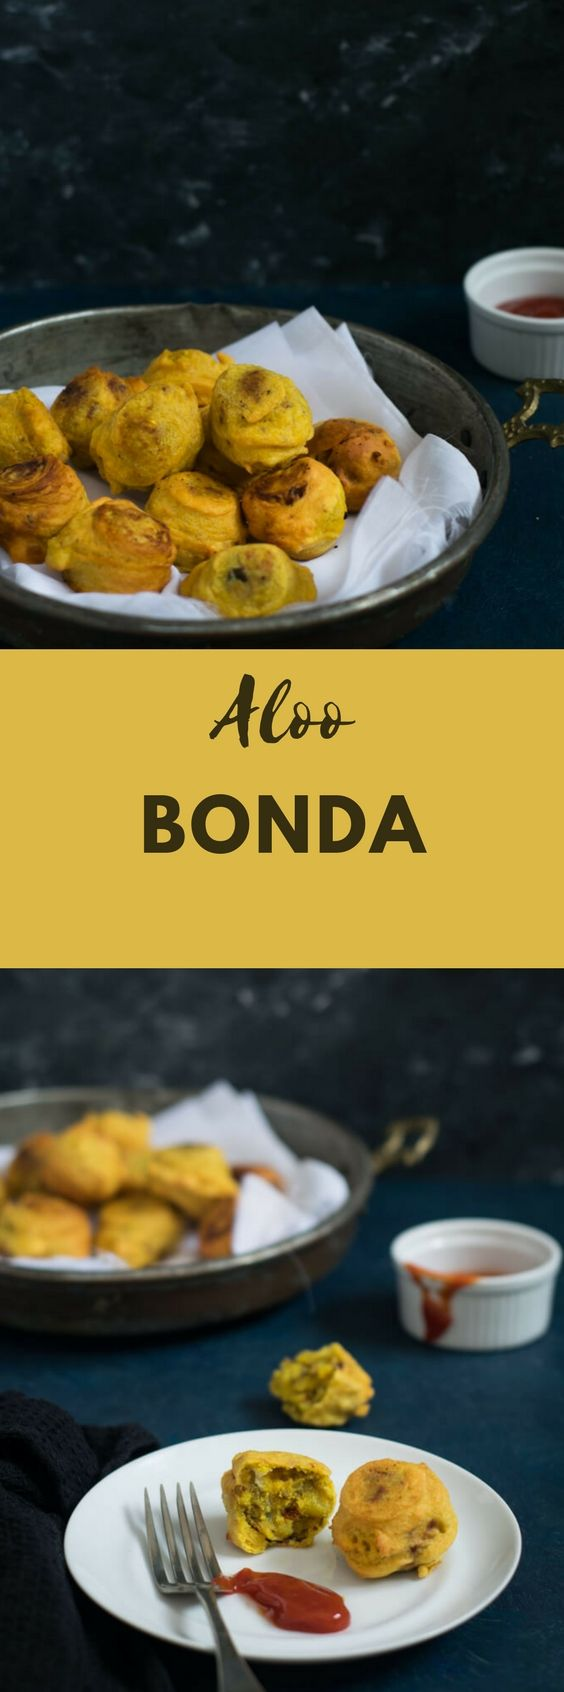 aloo bonda recipe, how to make aloo bonda, potato bonda recipe